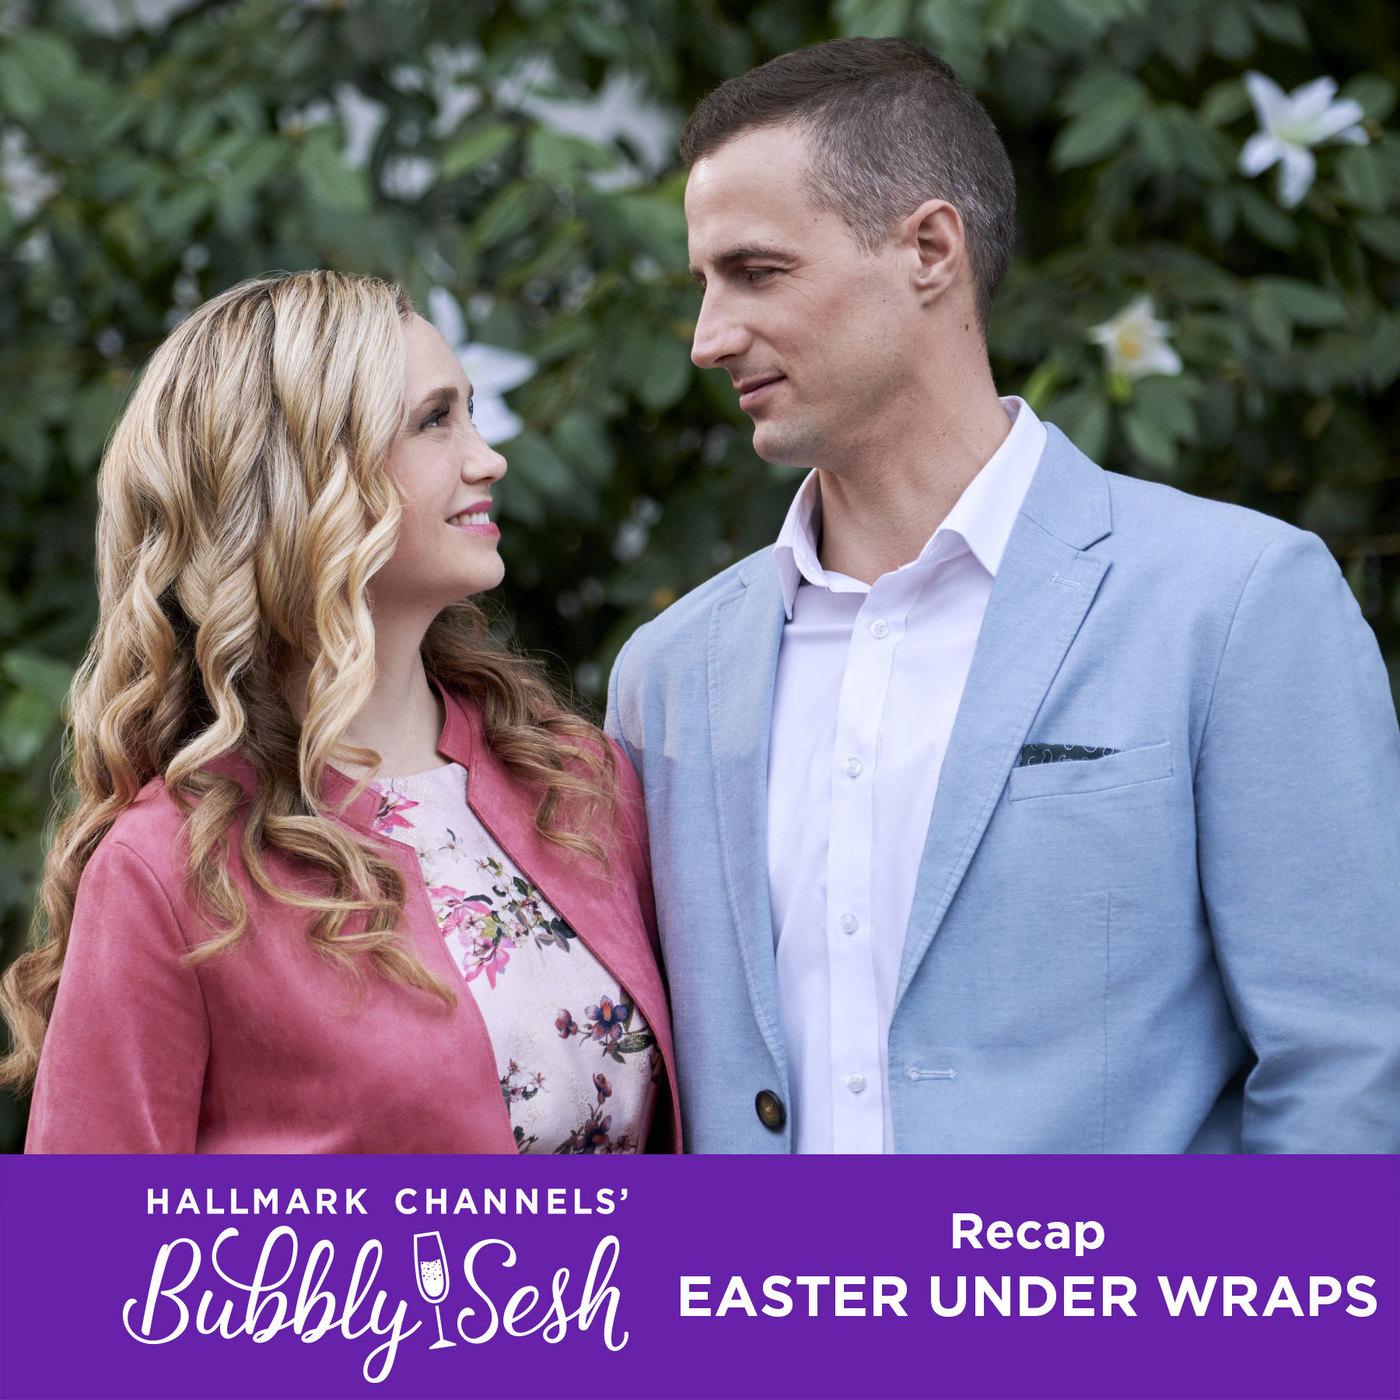 Easter Under Wraps Recap